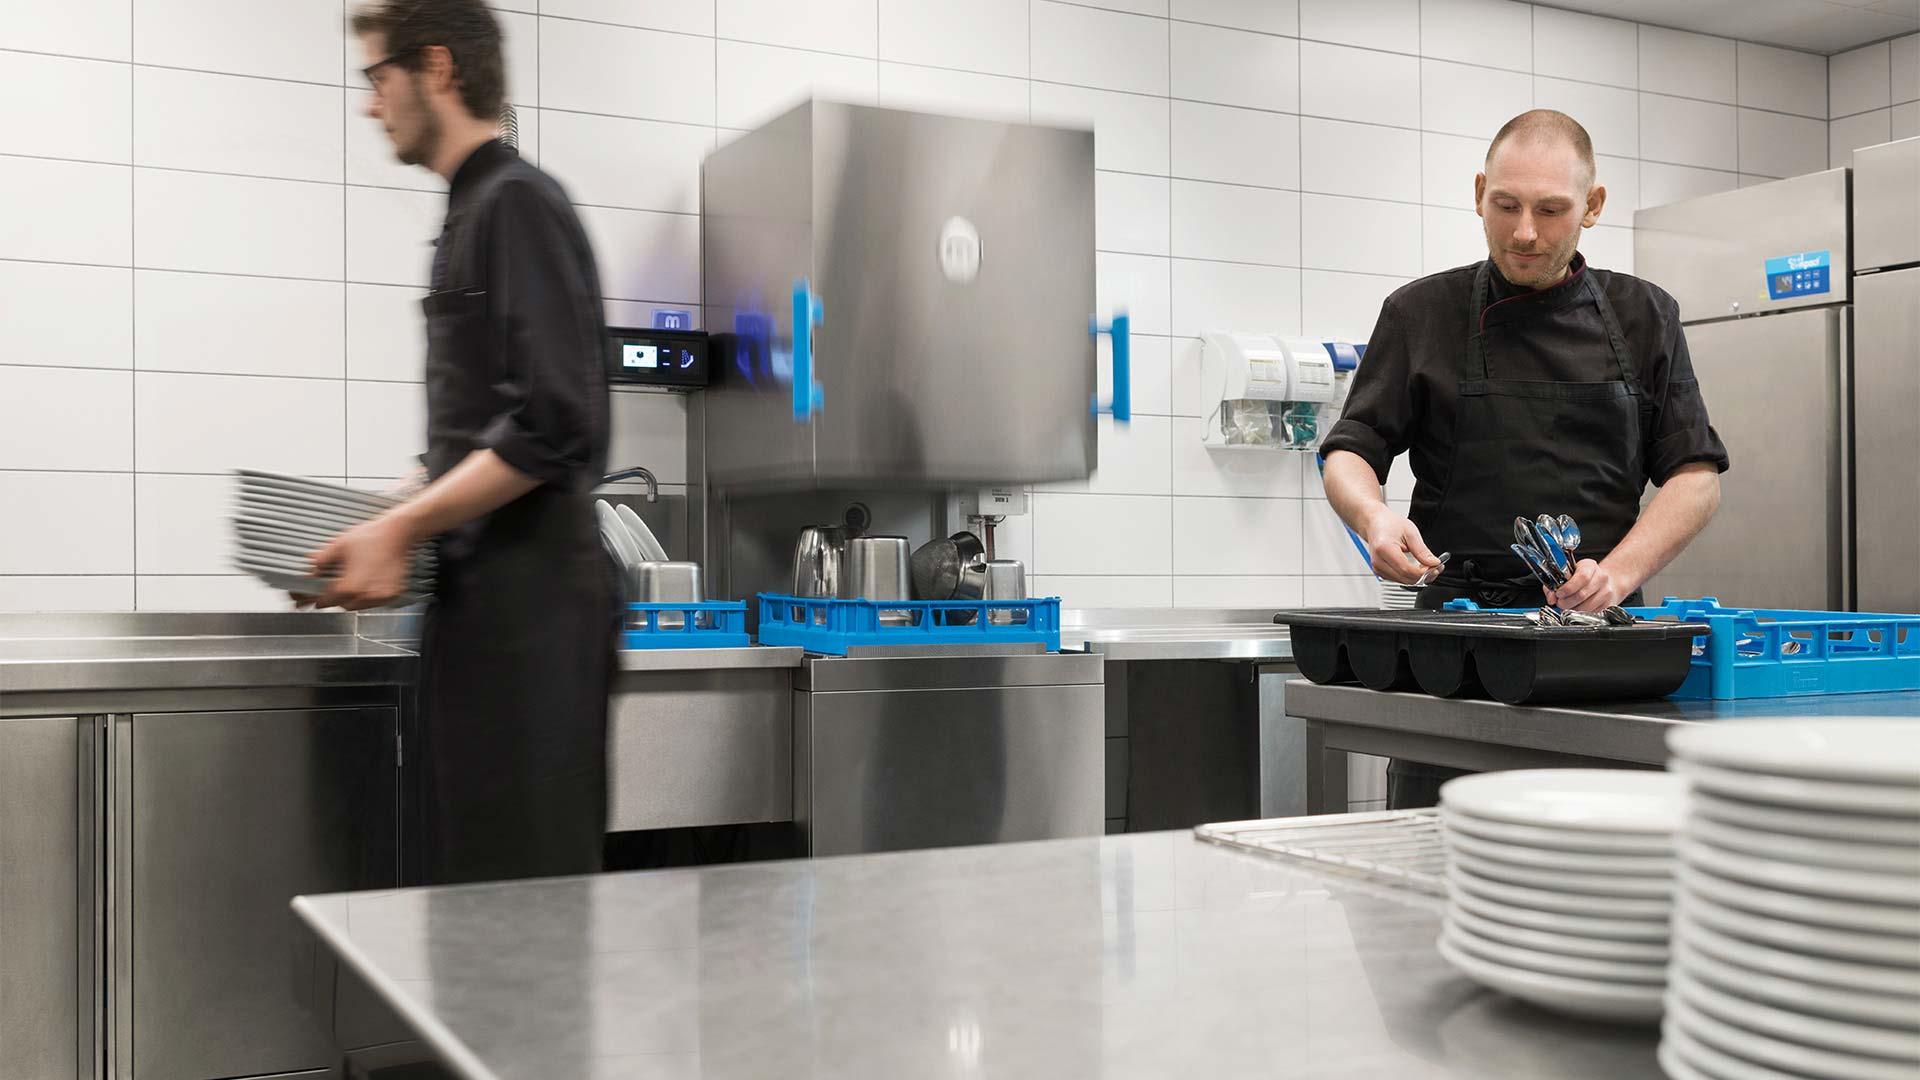 Commercial dishwashers for restaurants, food service - MEIKO